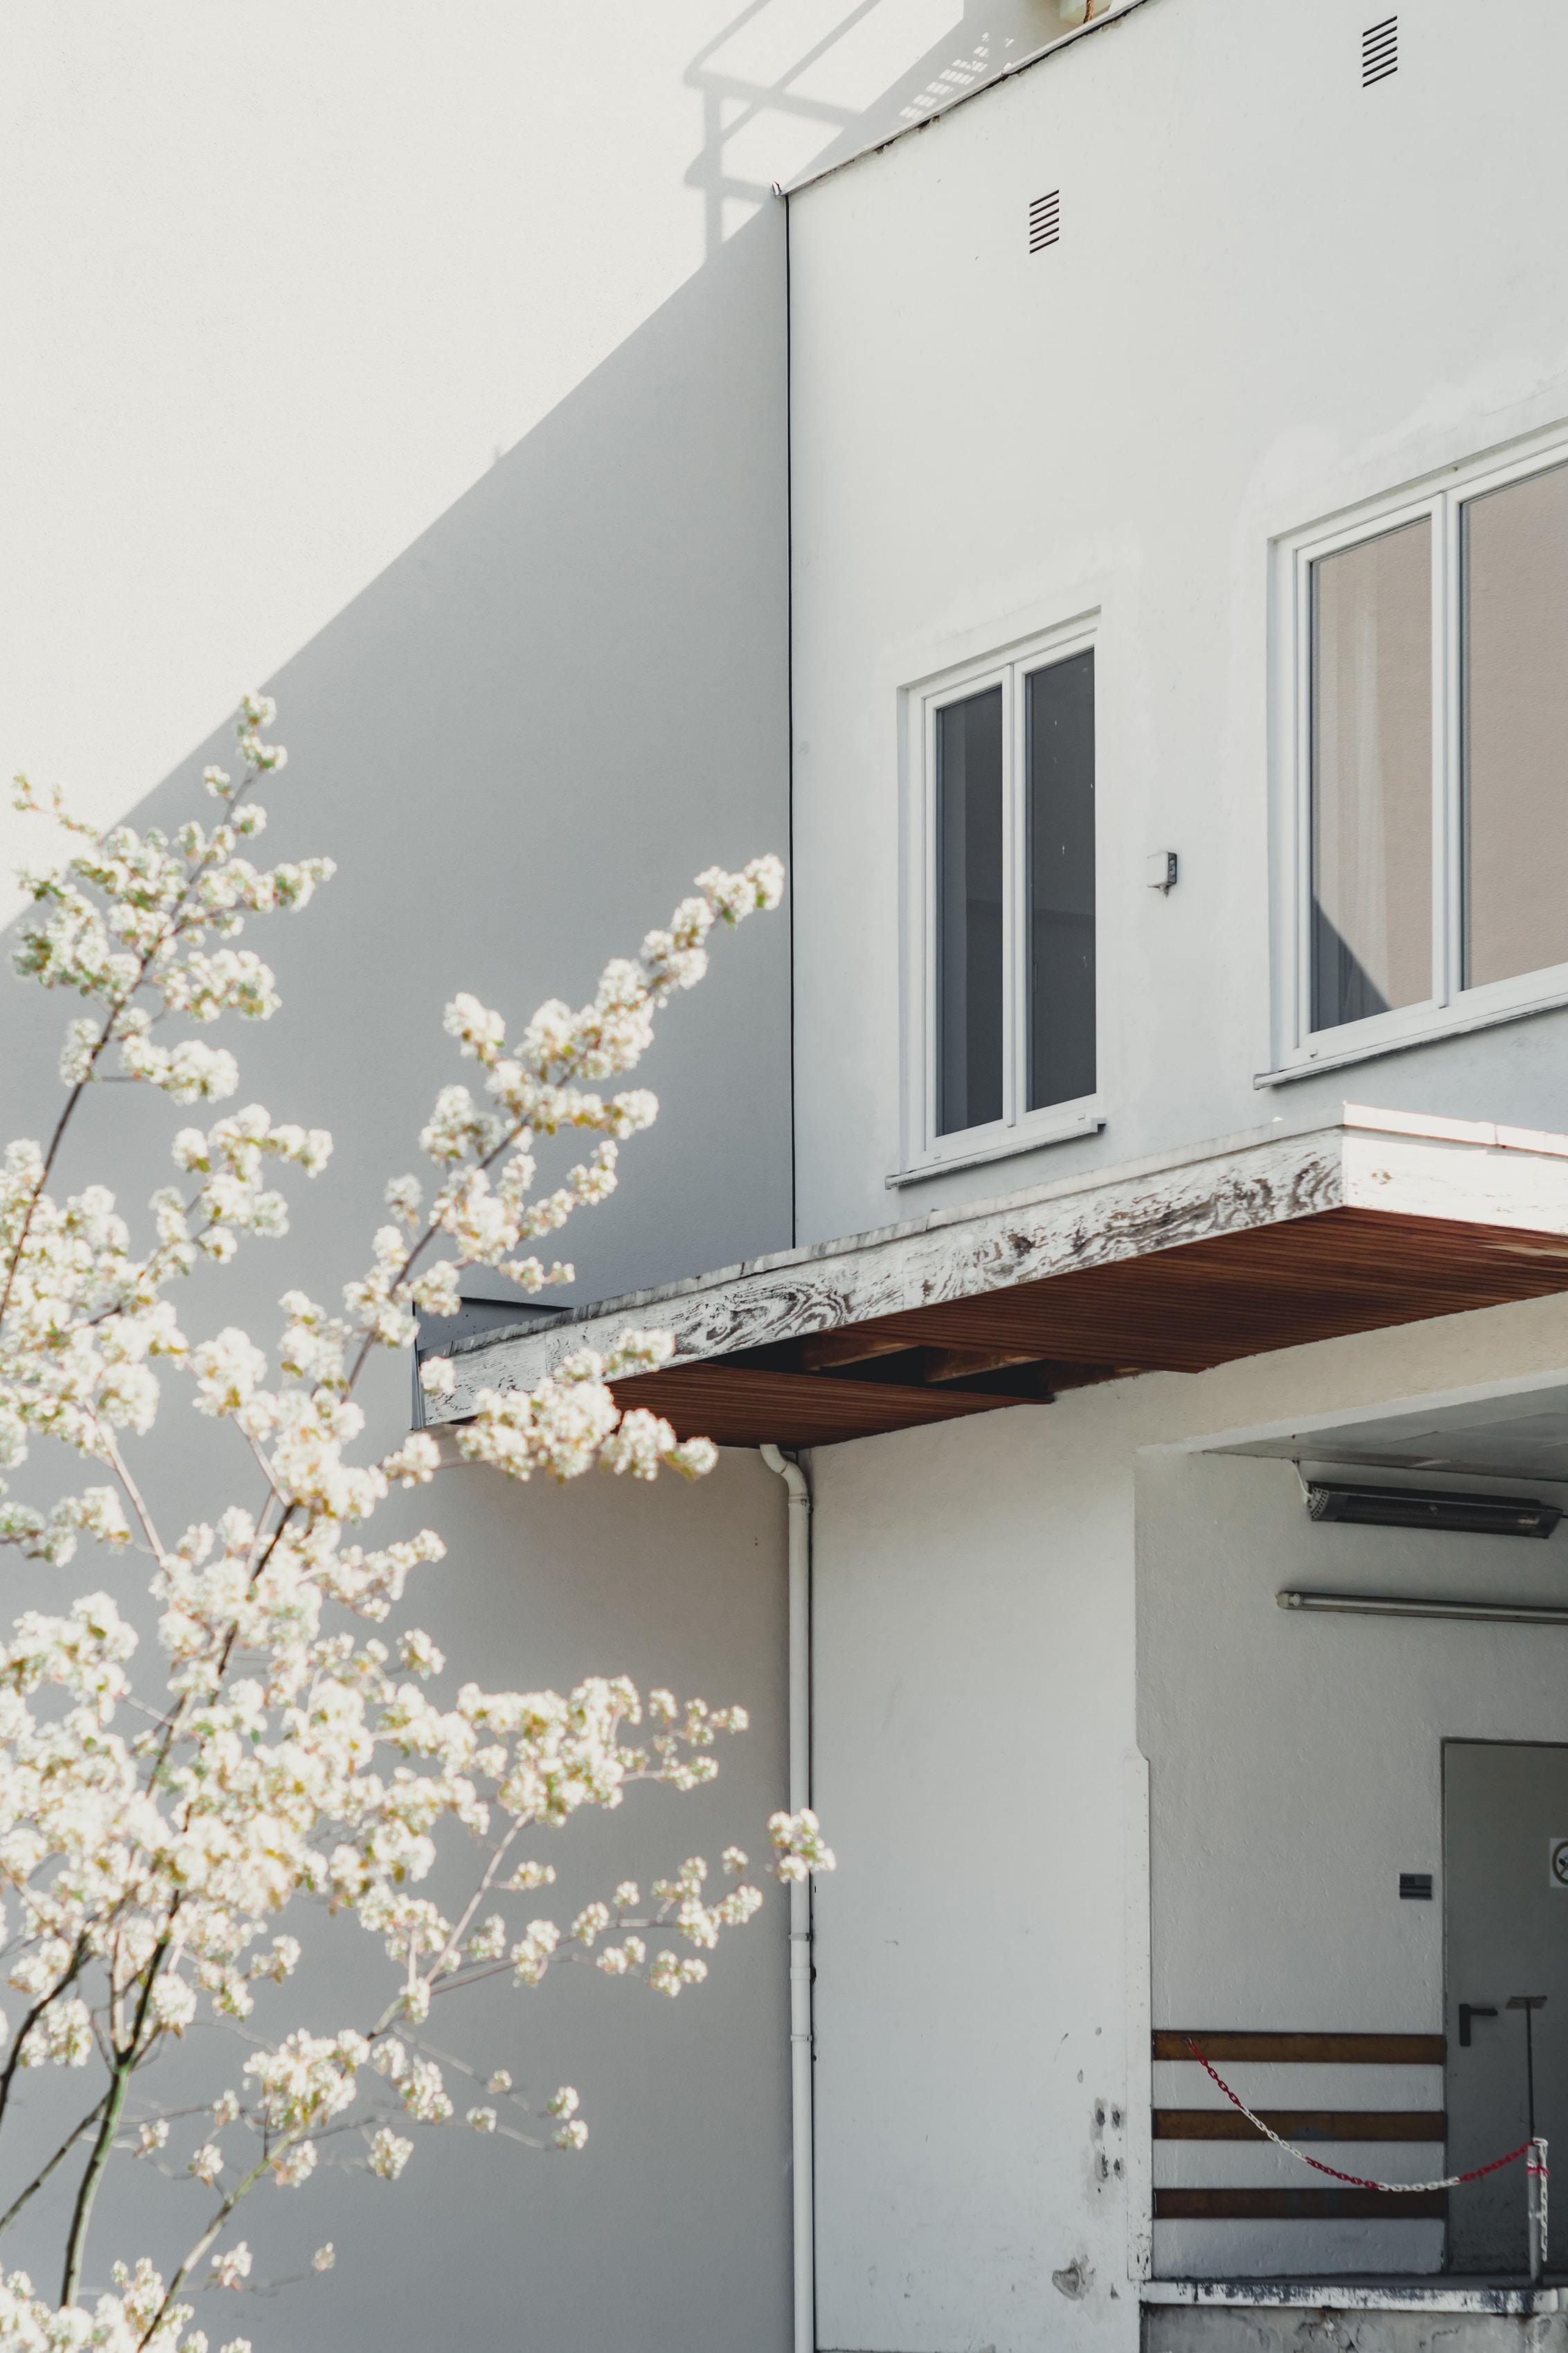 white cherry blossom tree near high-rise building